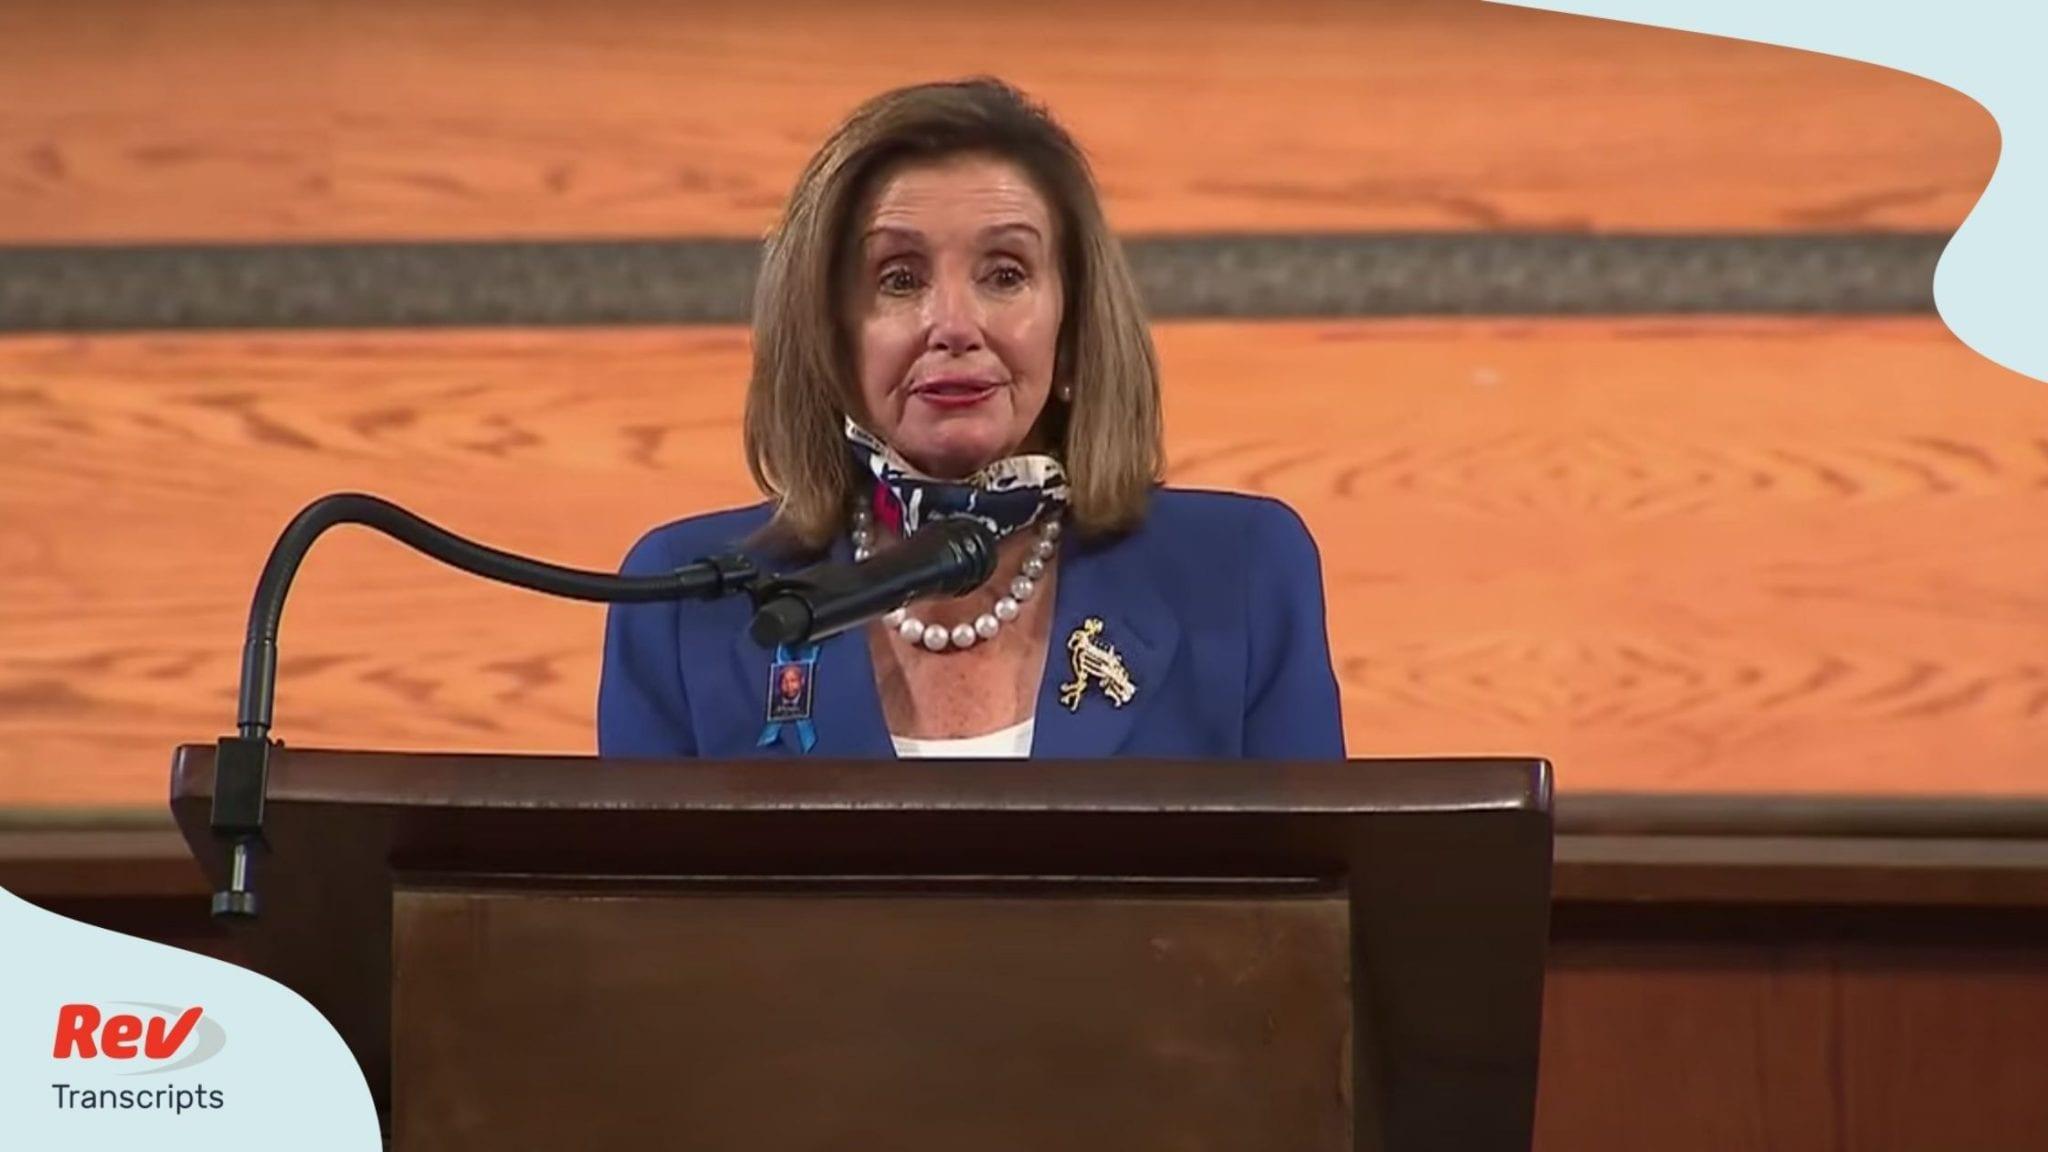 Nancy Pelosi Eulogy Transcript at John Lewis Funeral July 30